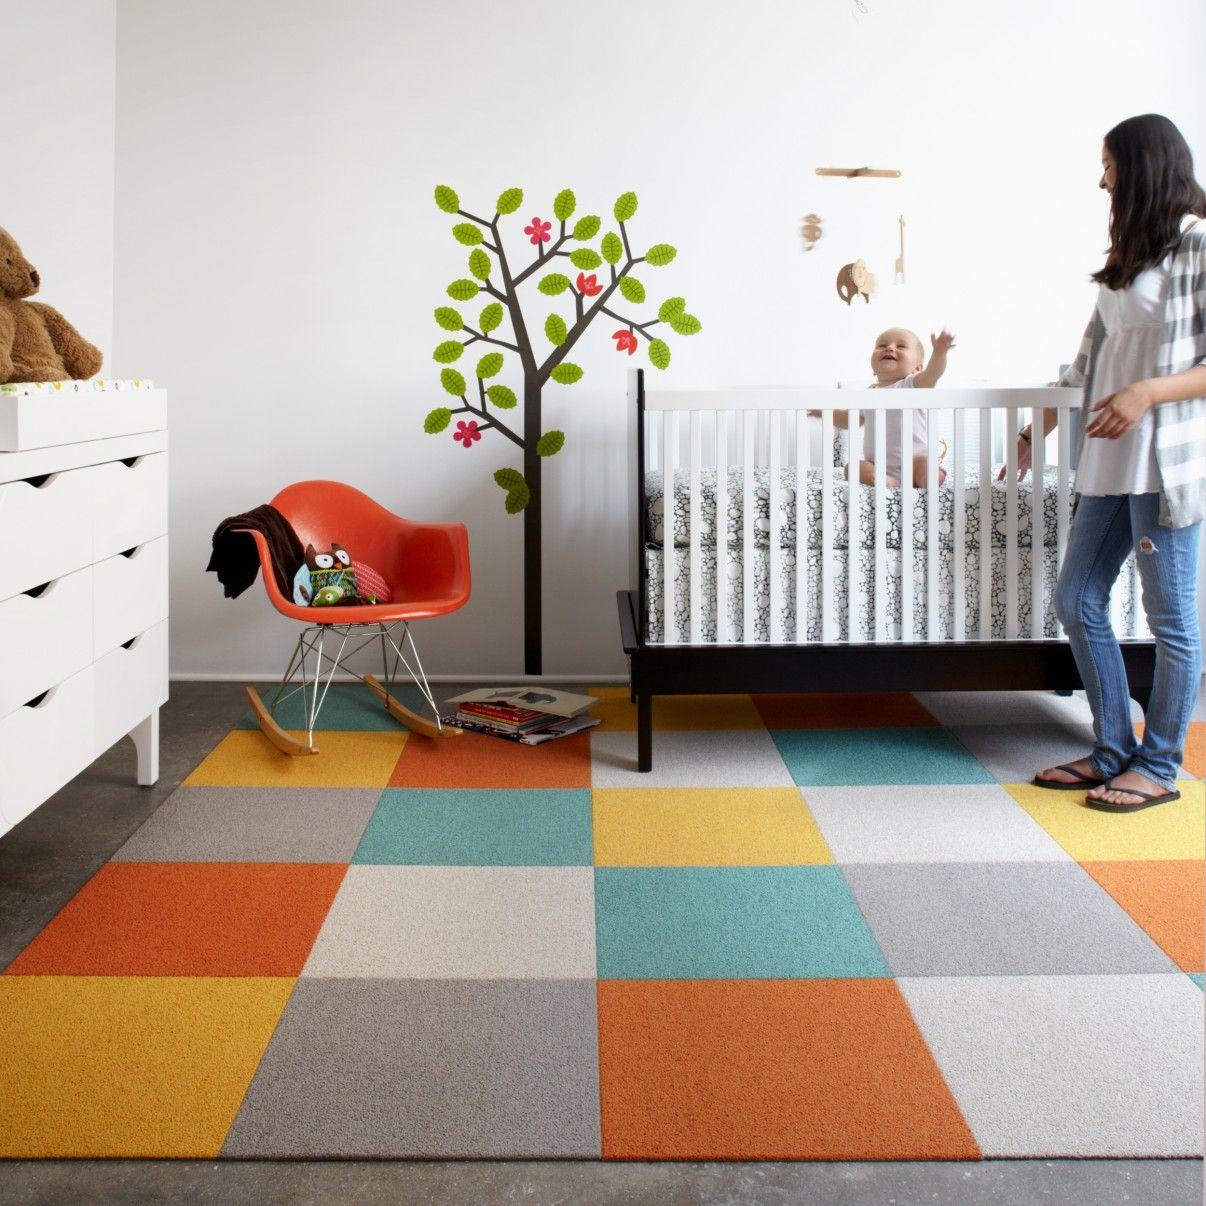 Toy Poodle Flooring Carpet Tiles Floor Cloth Ideas